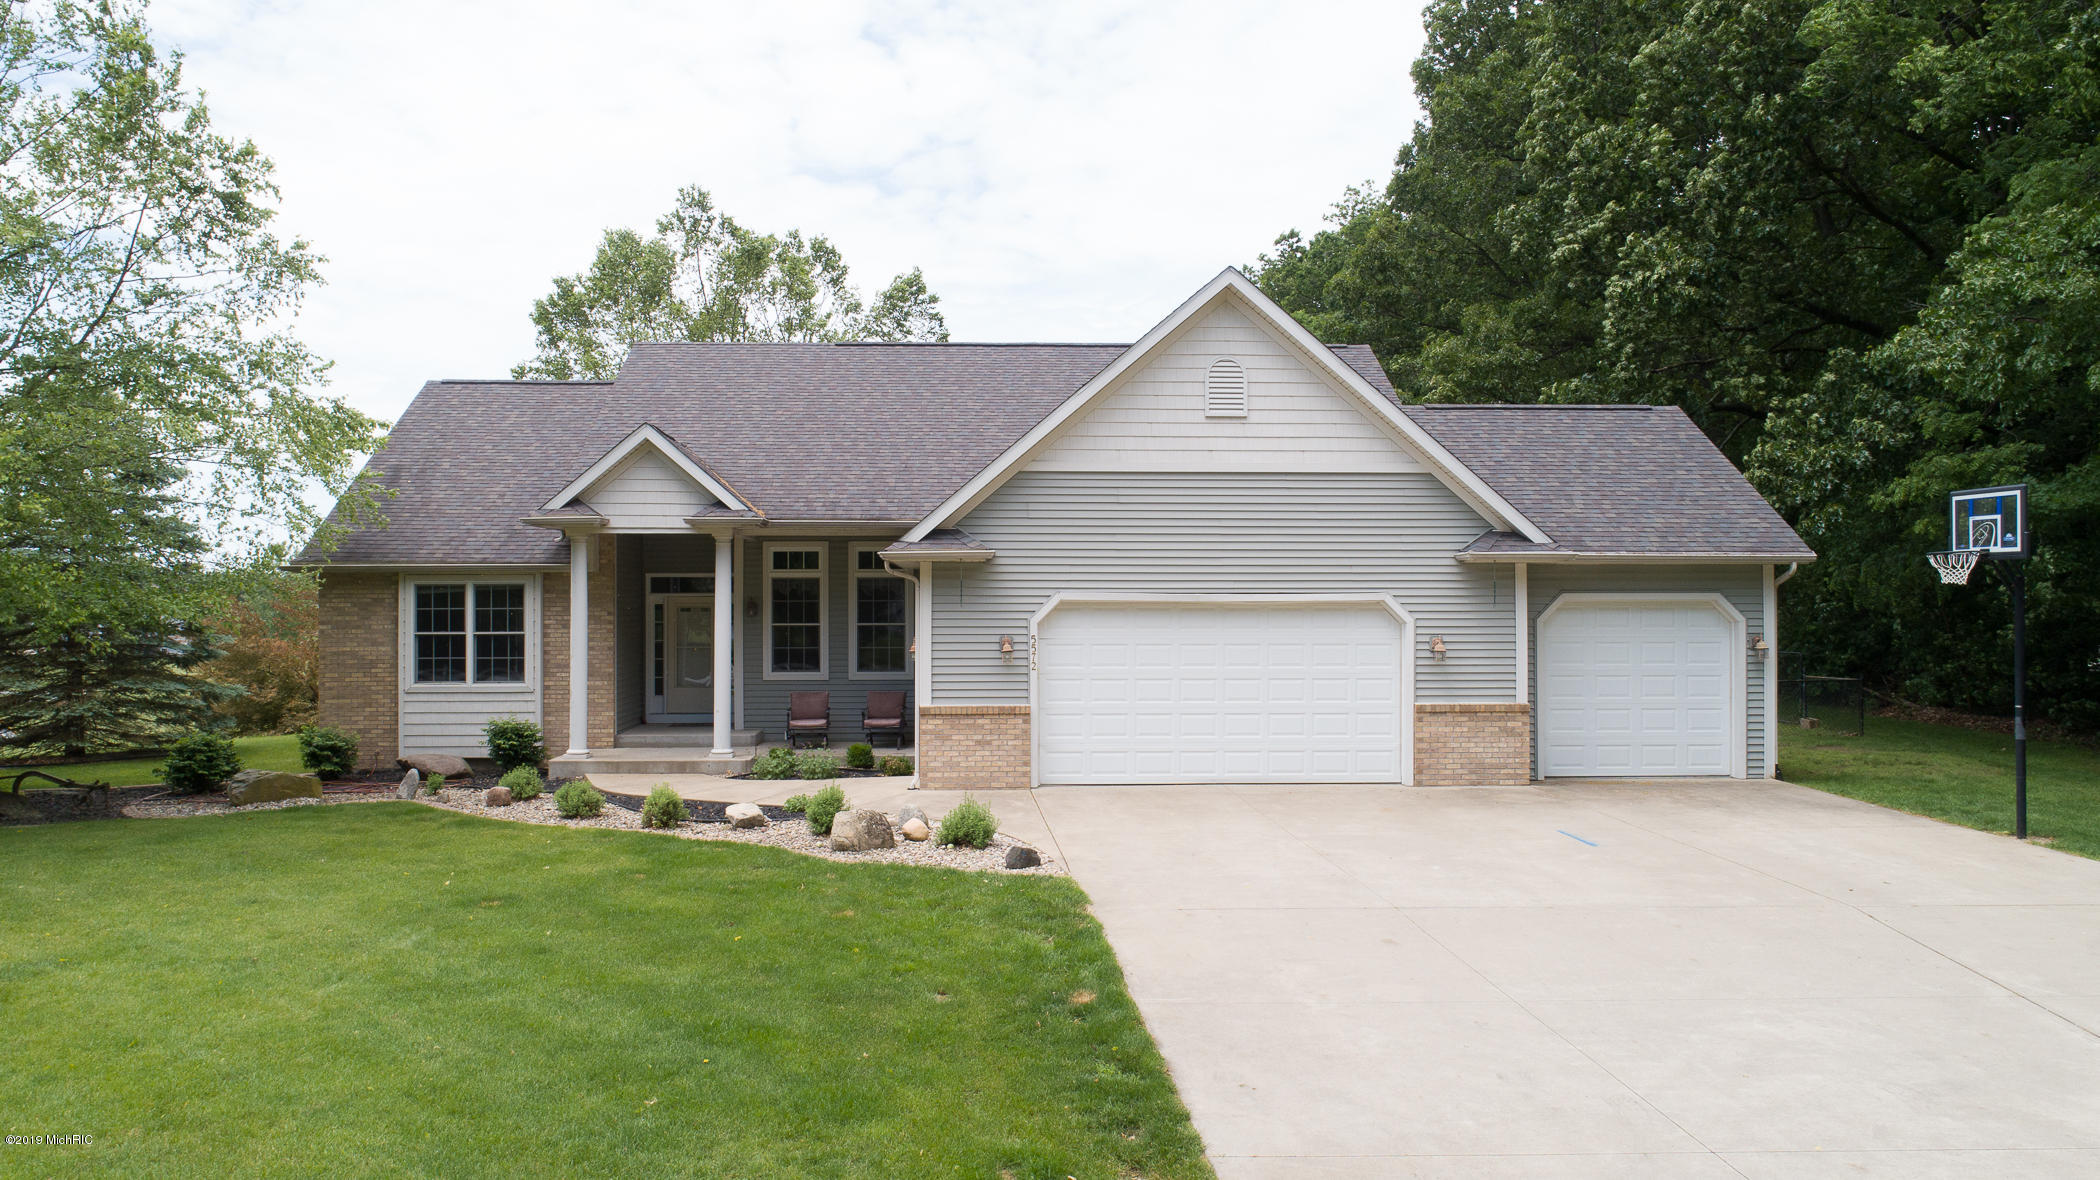 5572 1st Street, Kalamazoo, Michigan 49009, 4 Bedrooms Bedrooms, ,3 BathroomsBathrooms,Residential,For Sale,1st,19027251